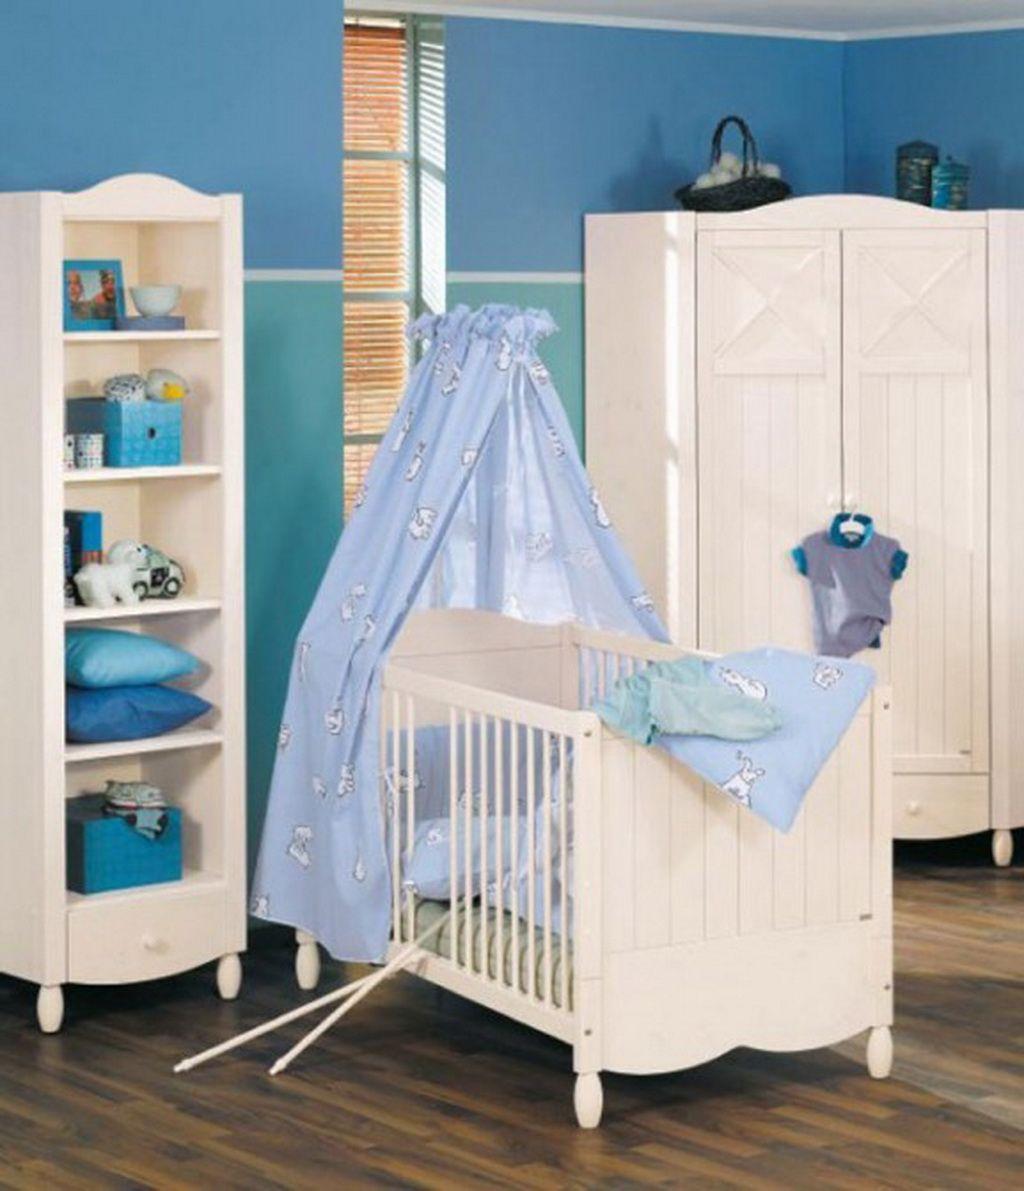 Ordinaire Bedding Decorating U0026 Ideas Newborn Baby Nursery Room ...